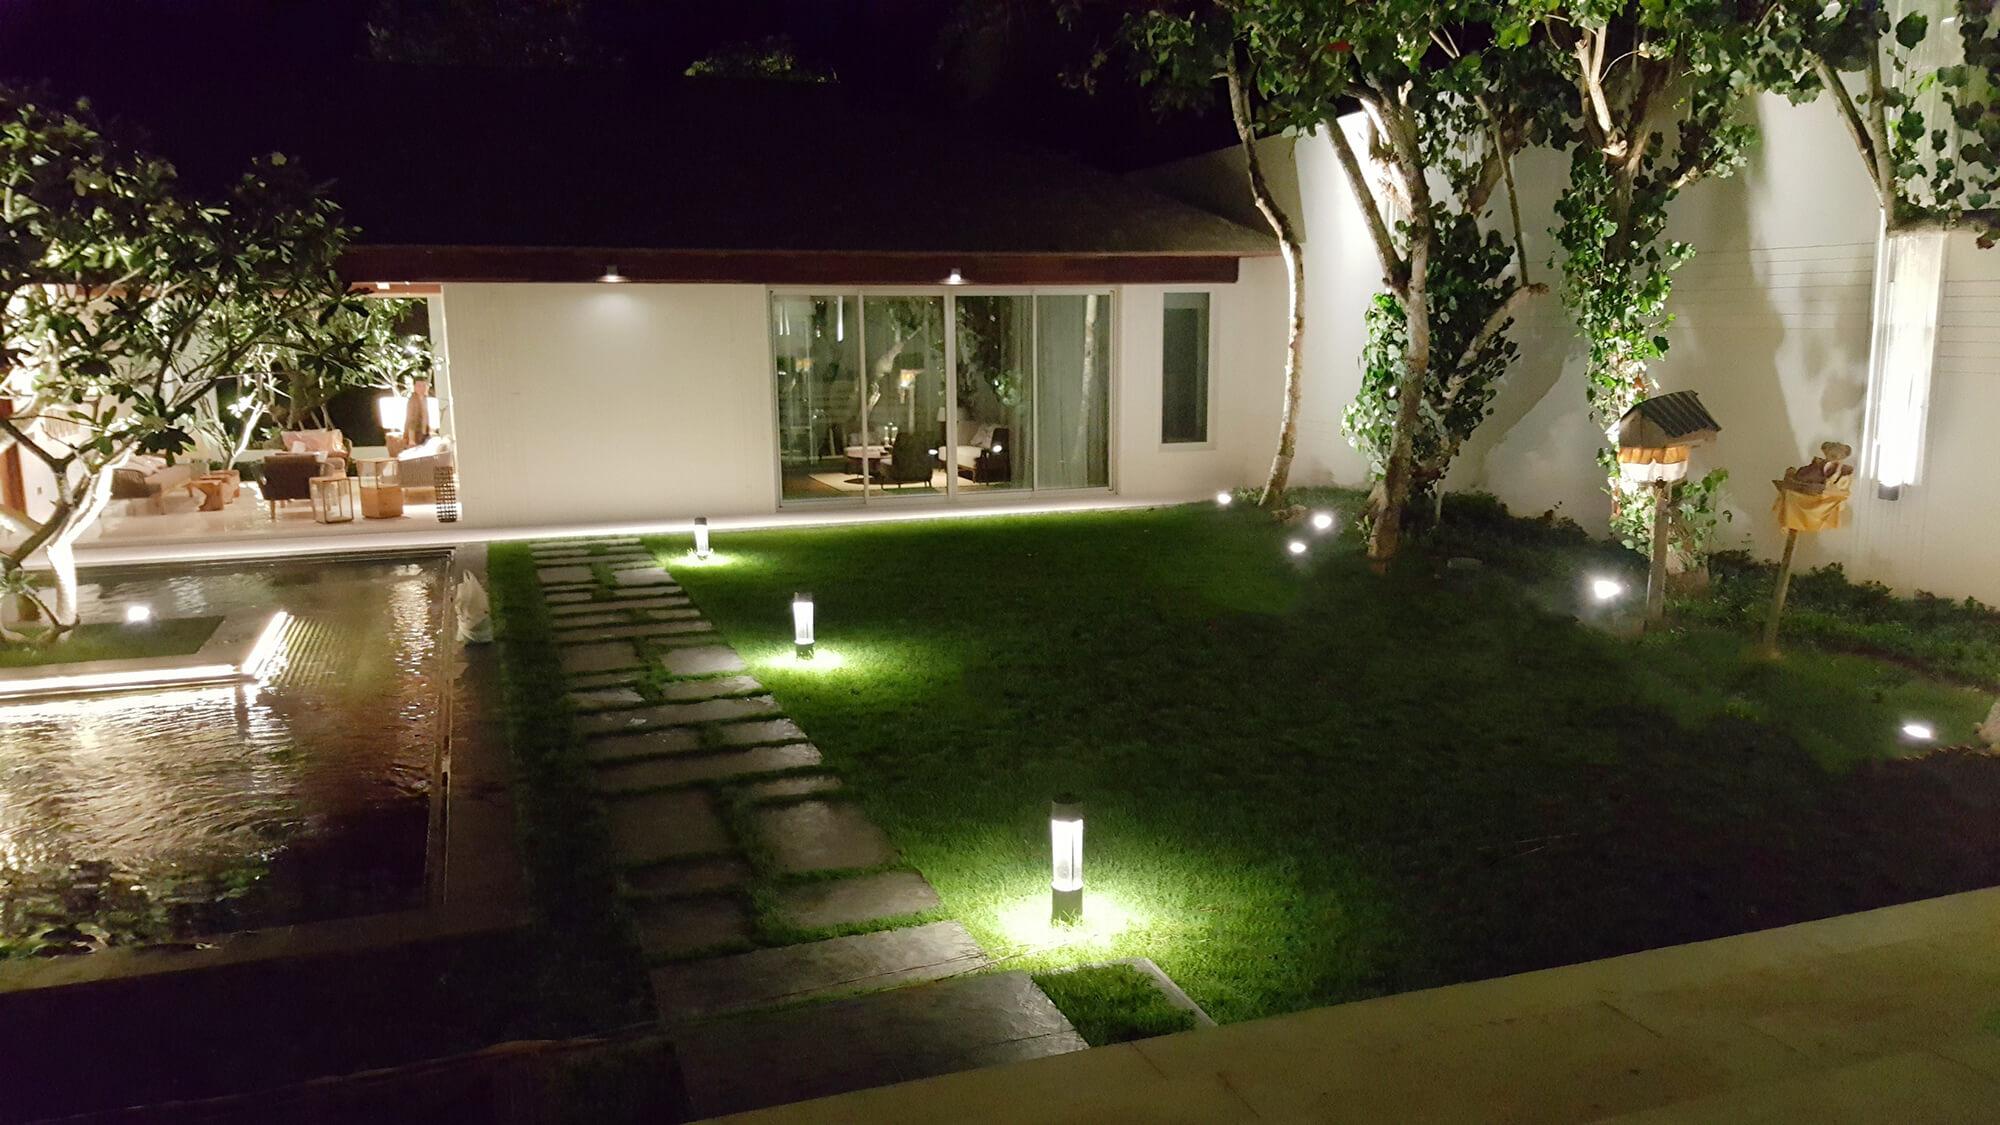 bali vila garden night